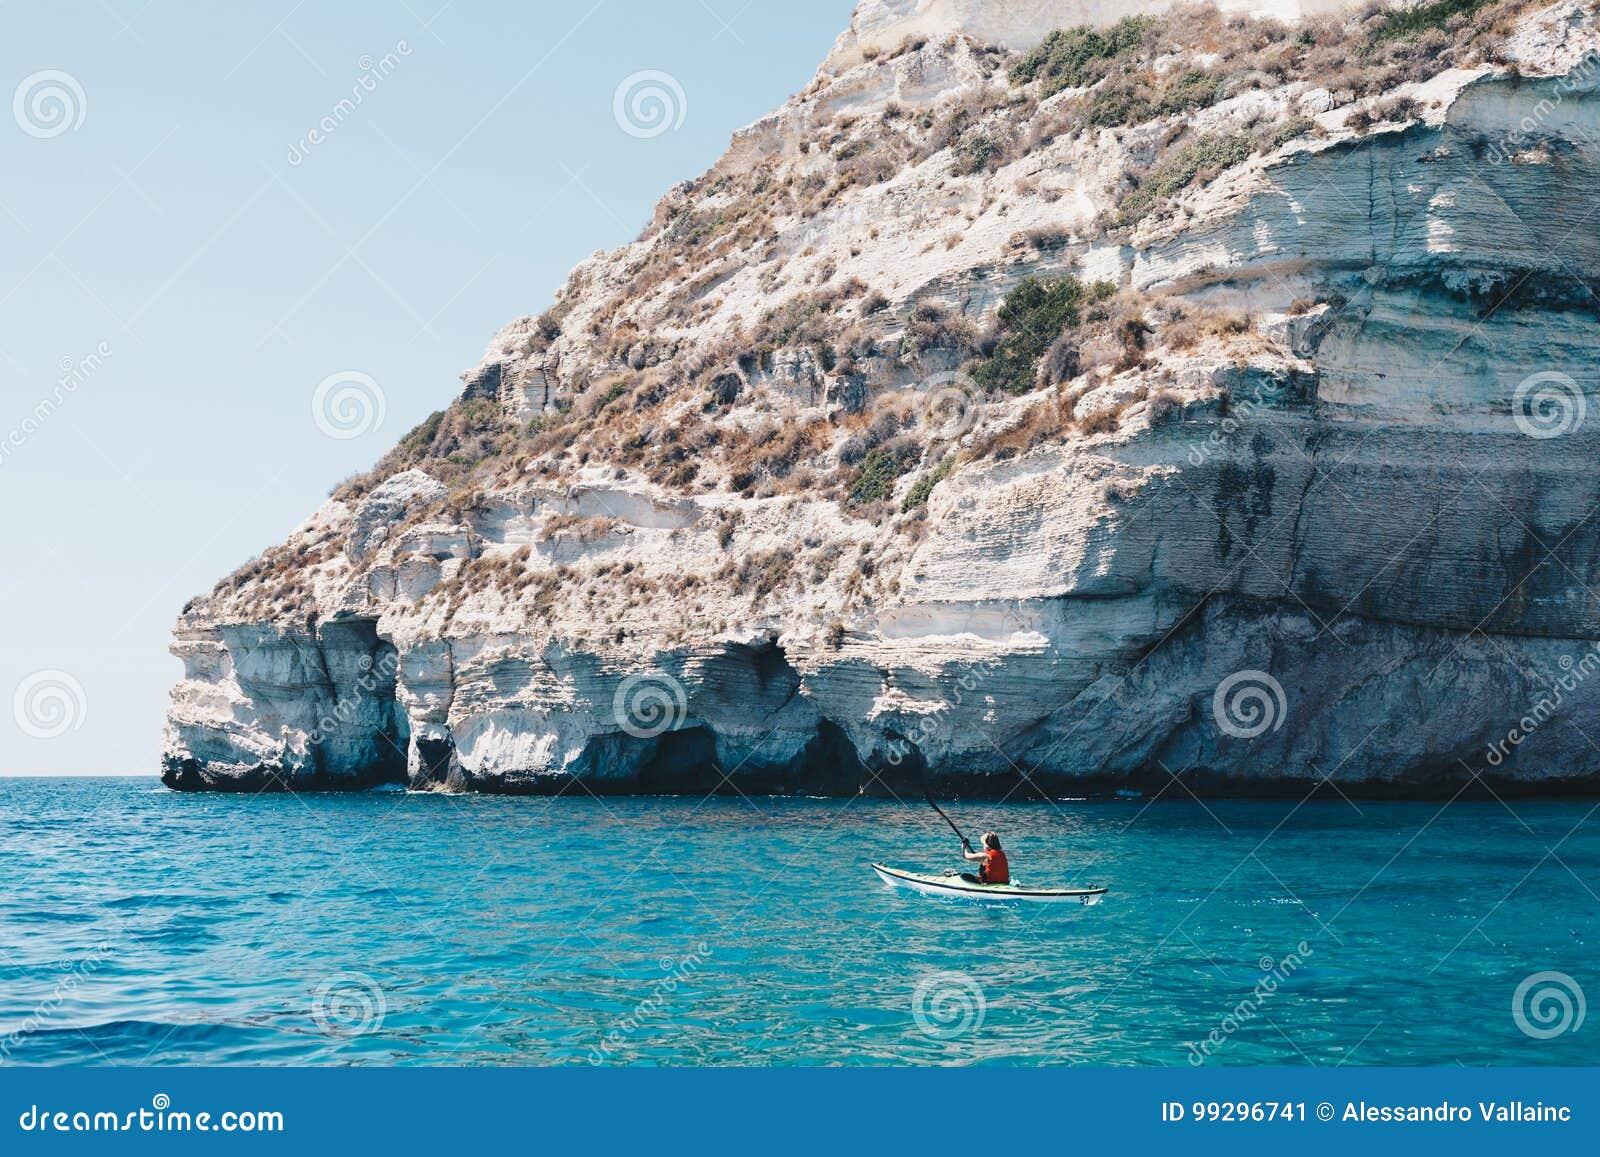 Woman paddles kayak in a calm sea in Sardinia Italy